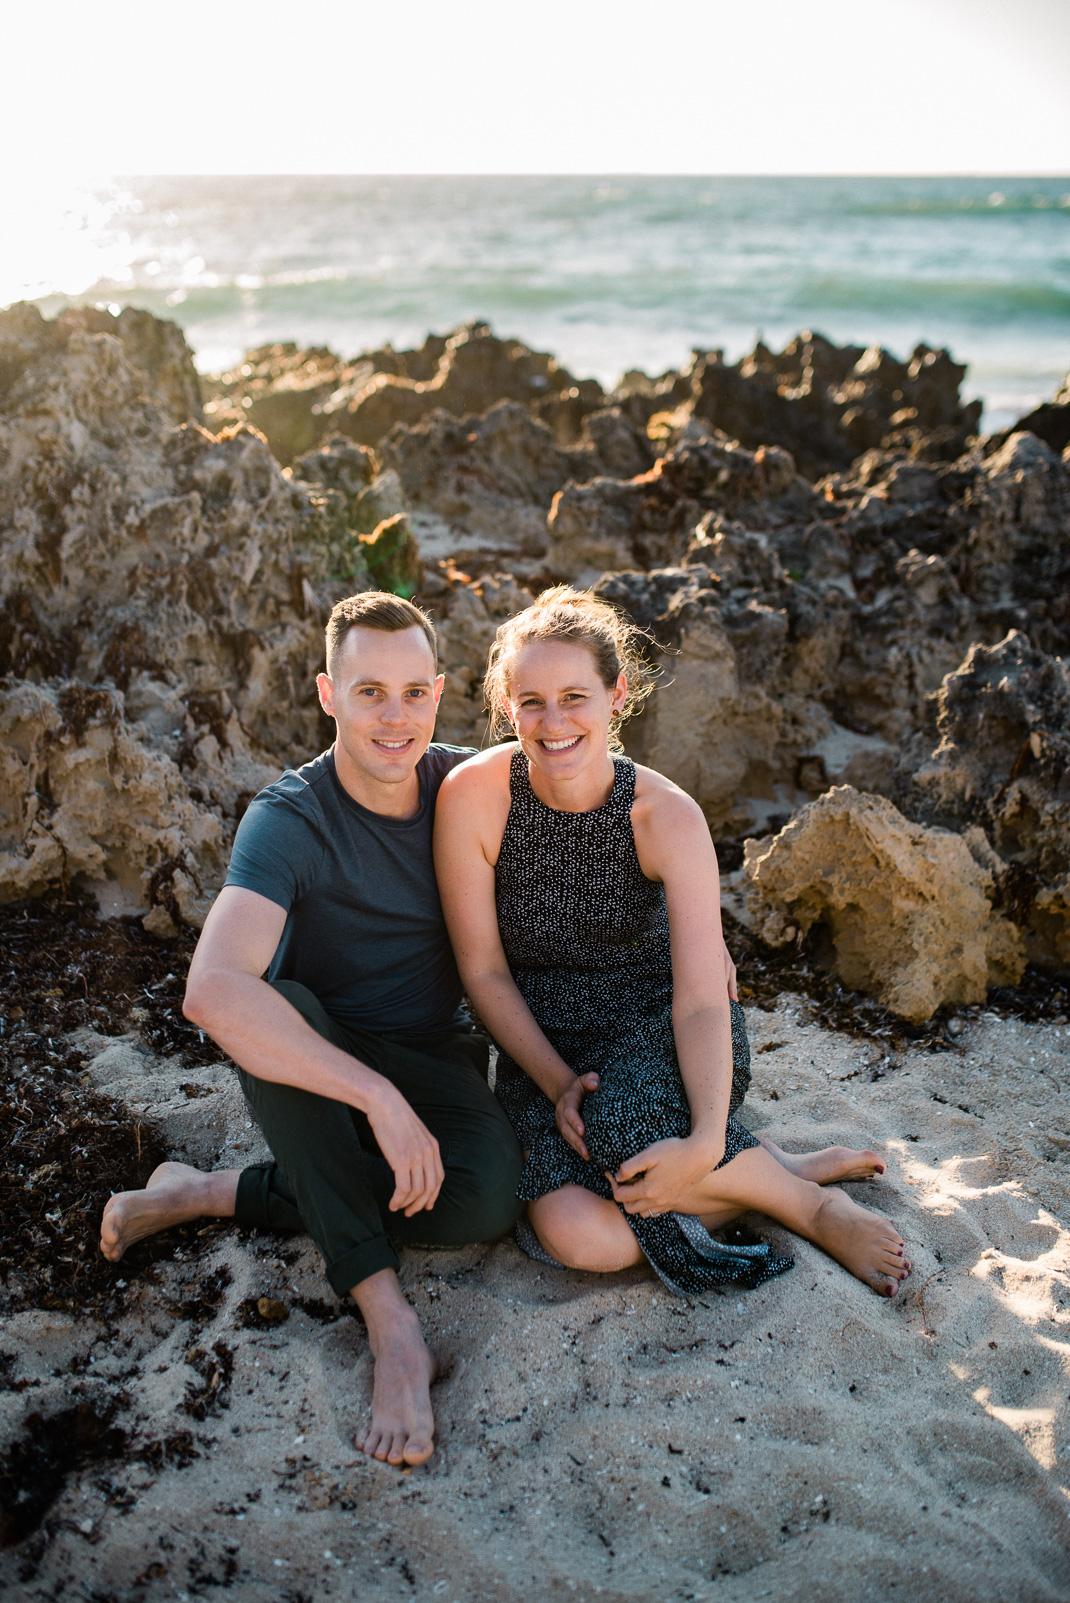 tim-jessica-beach-engagement-prewedding-photography-2.JPG